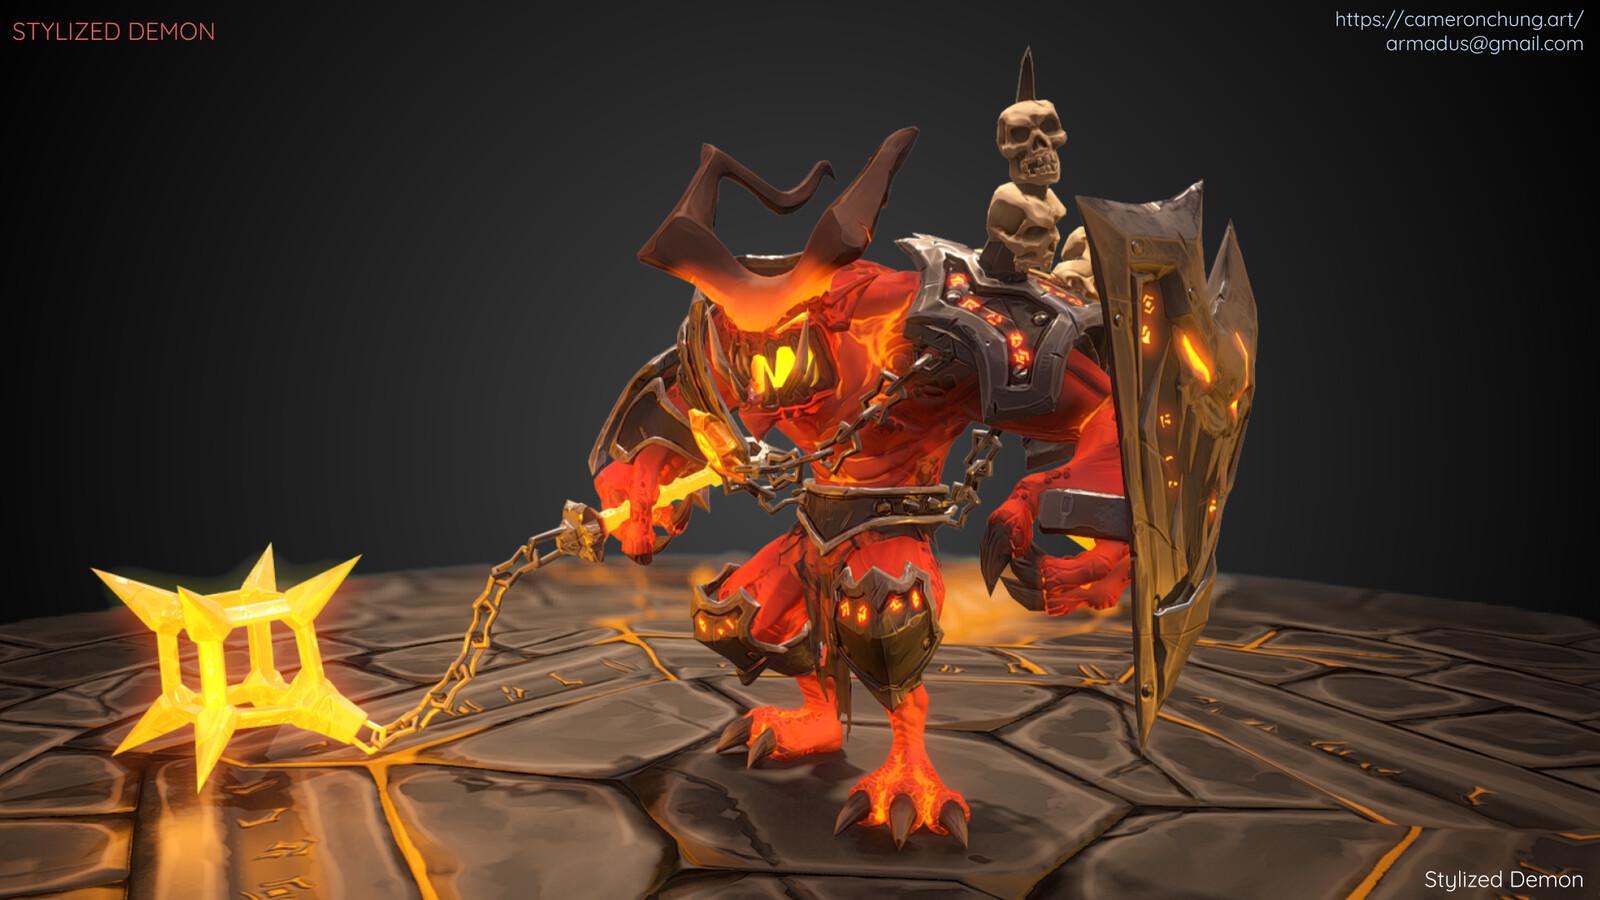 Stylized Demon - Marmoset Toolbag 2